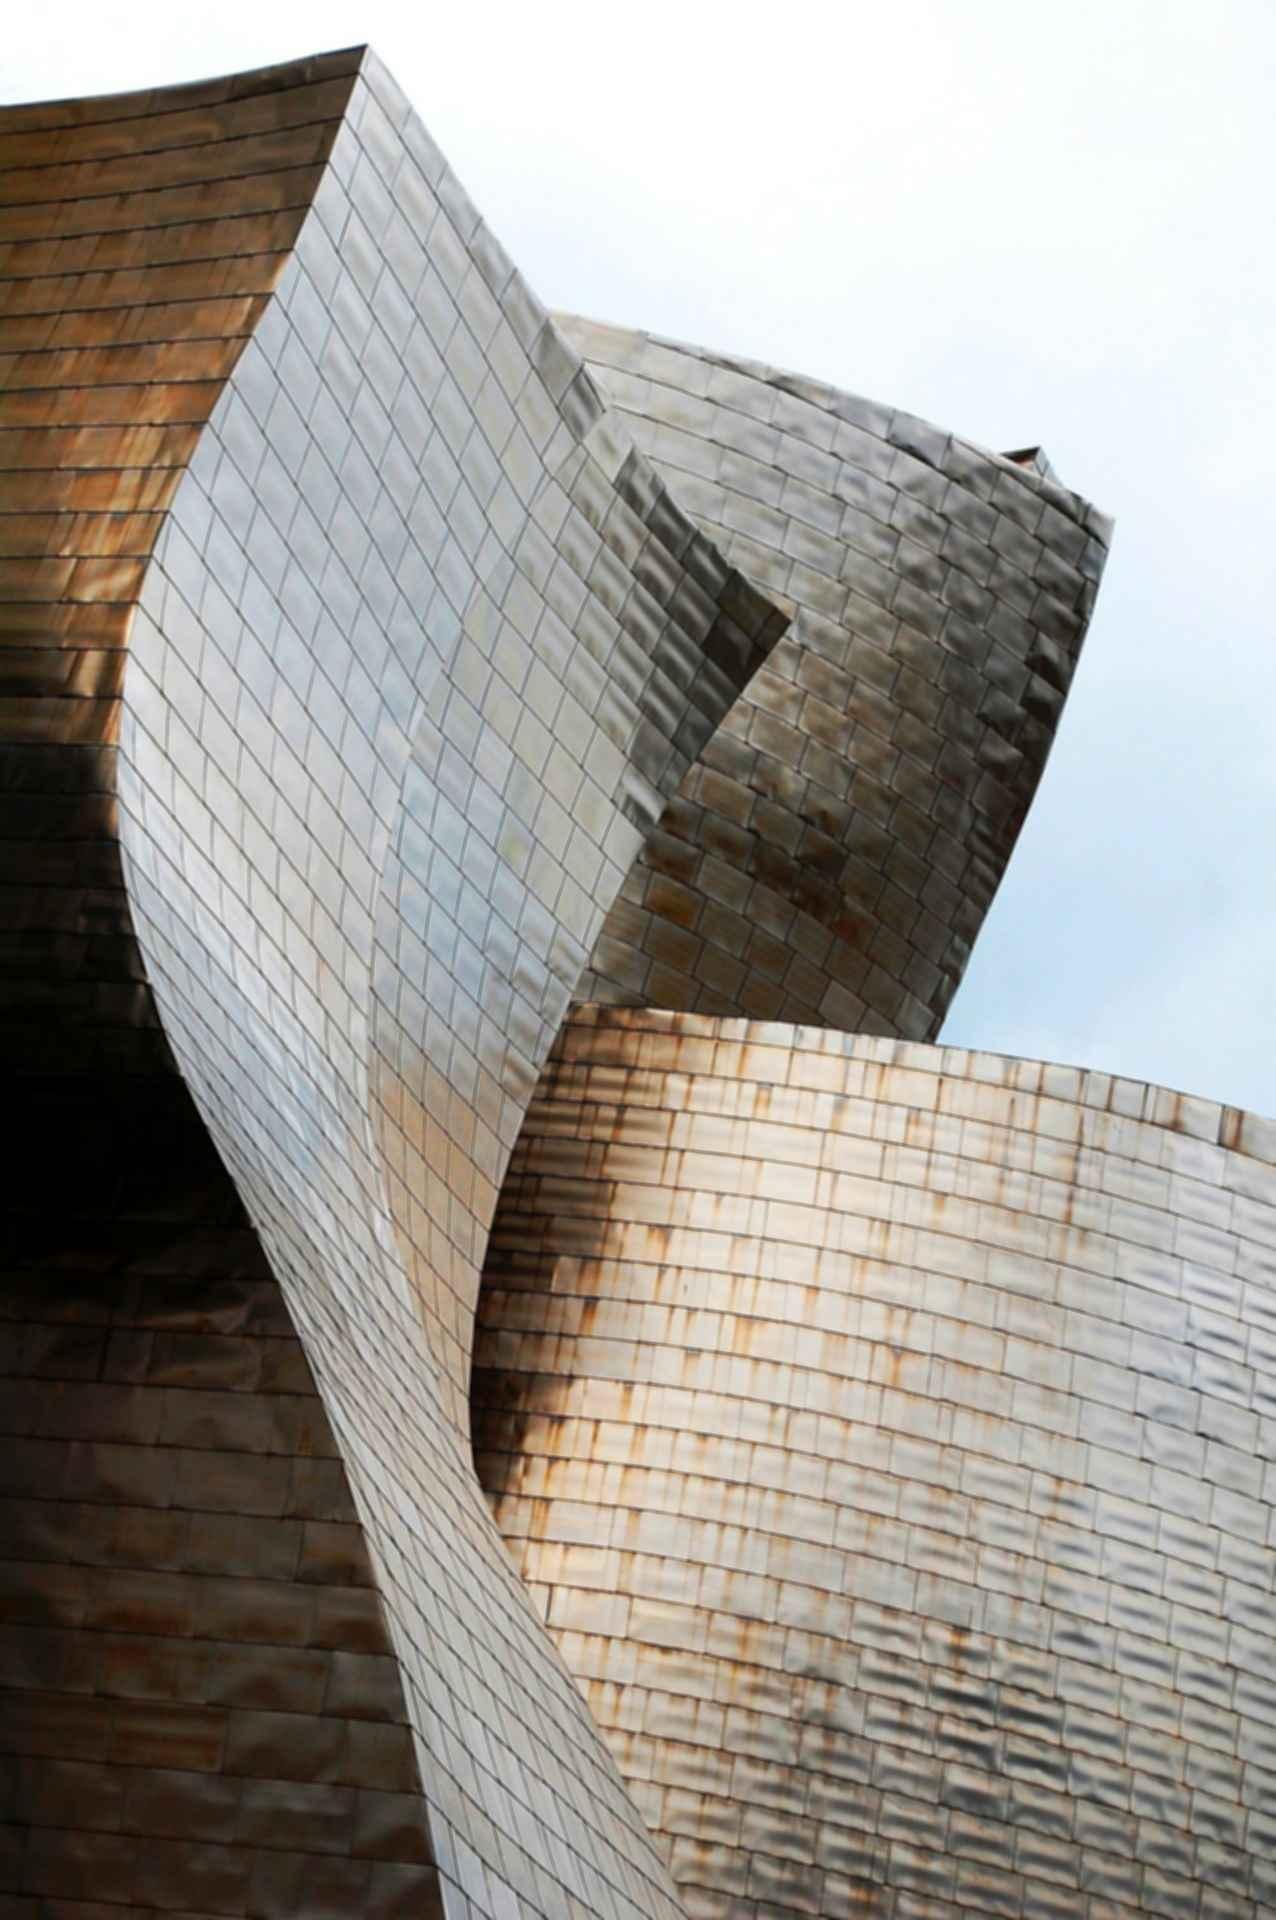 Guggenheim Museum Bilbao - Siding Detail